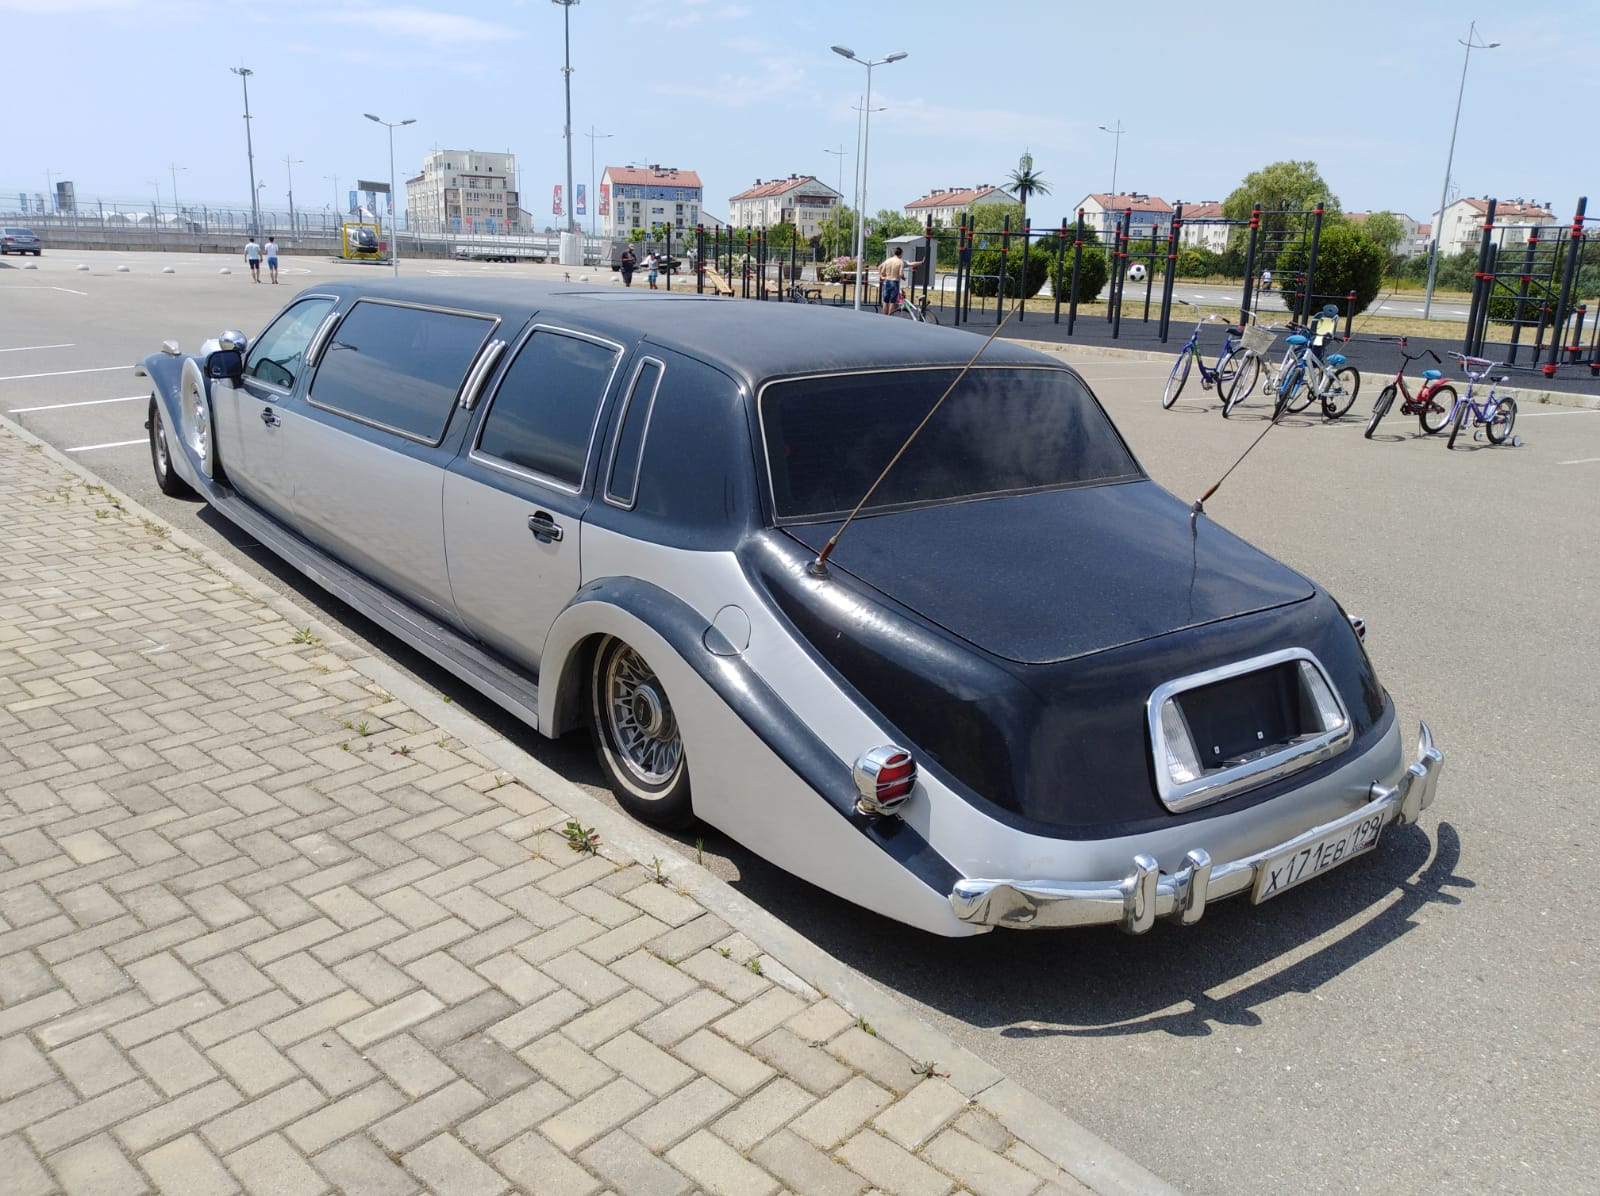 Mundial de Fútbol de Rusia: todos los coches que verás